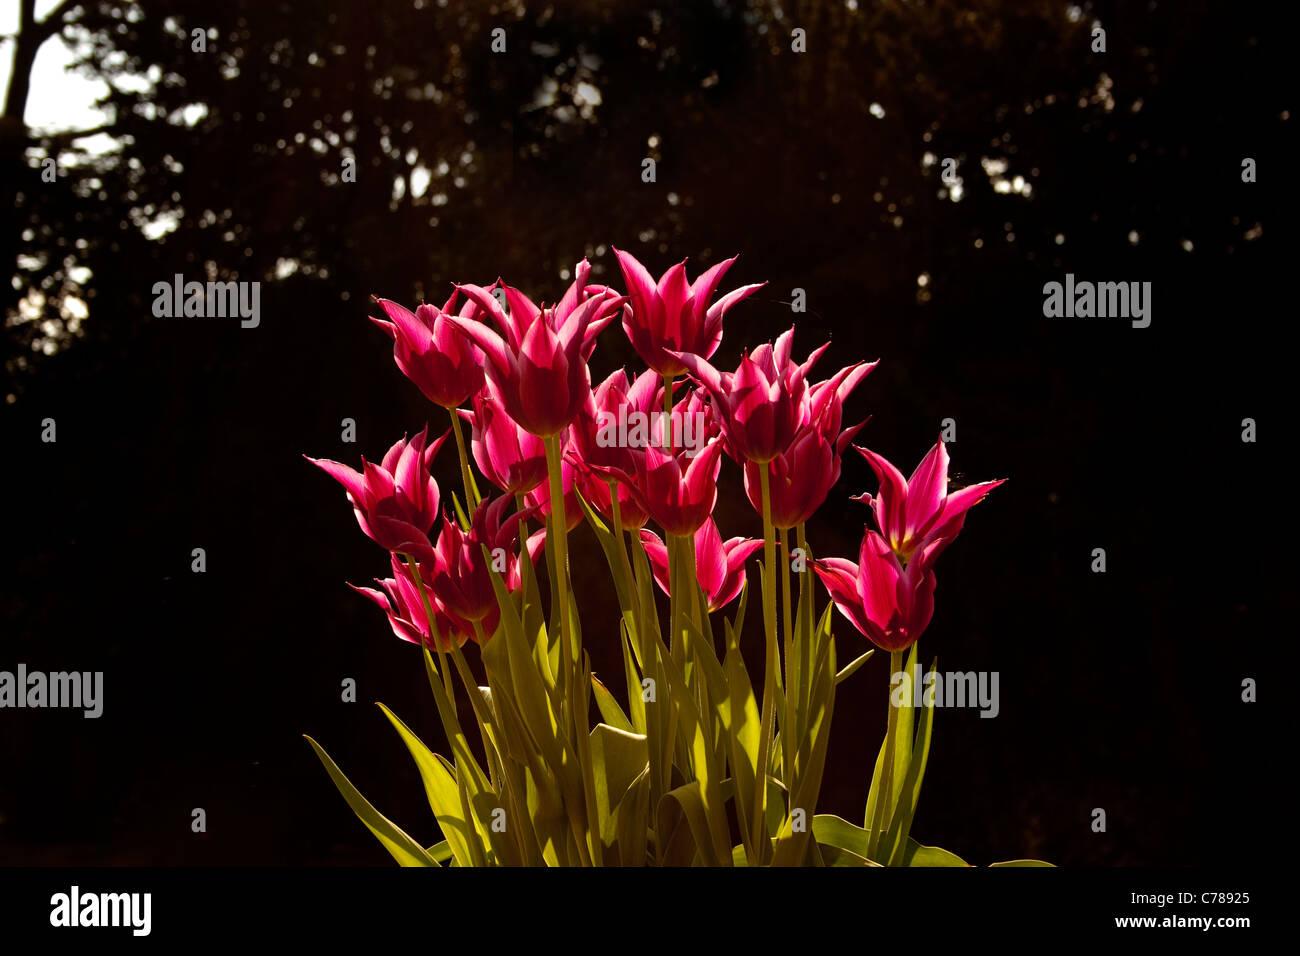 Tulip pink magenta dark back sun behind lit head flower bunch group stems leaves leaf vibrant vivid - Stock Image